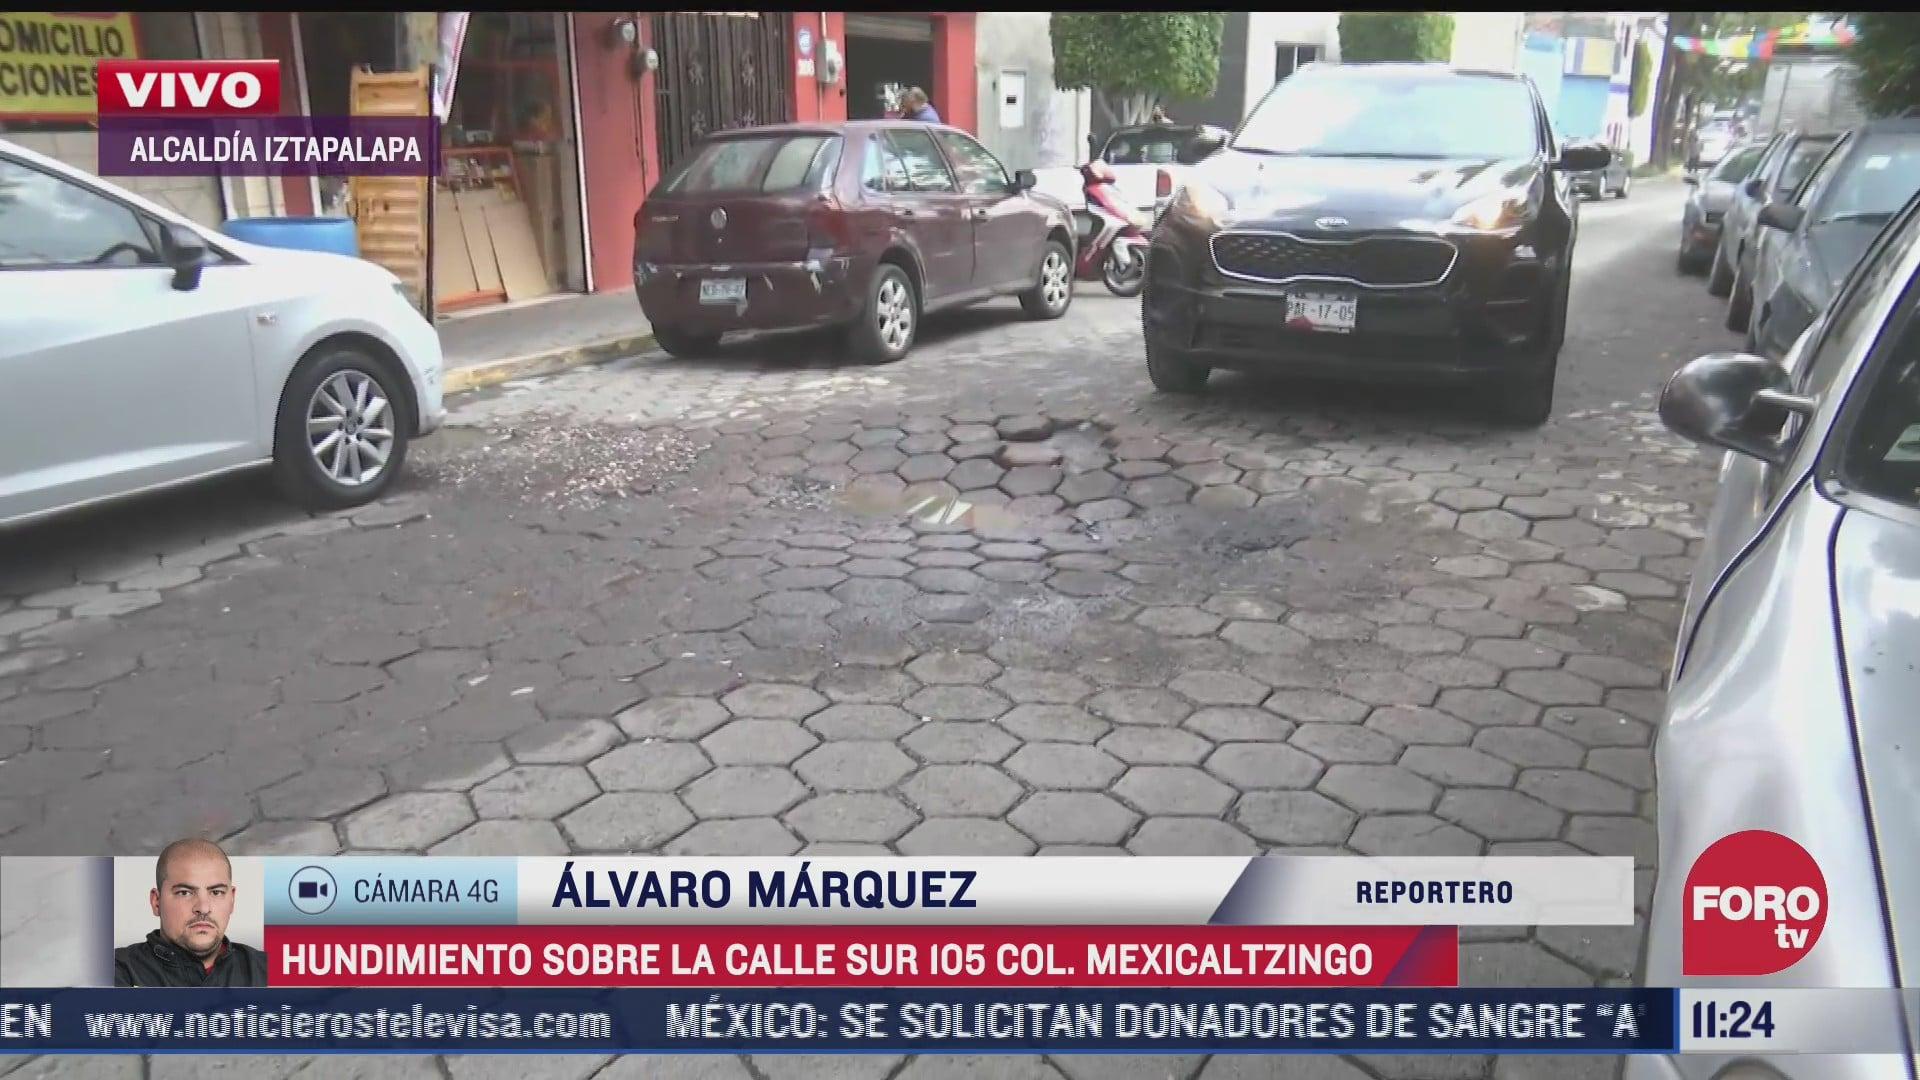 reportan hundimiento en calle de la alcaldia iztapalapa